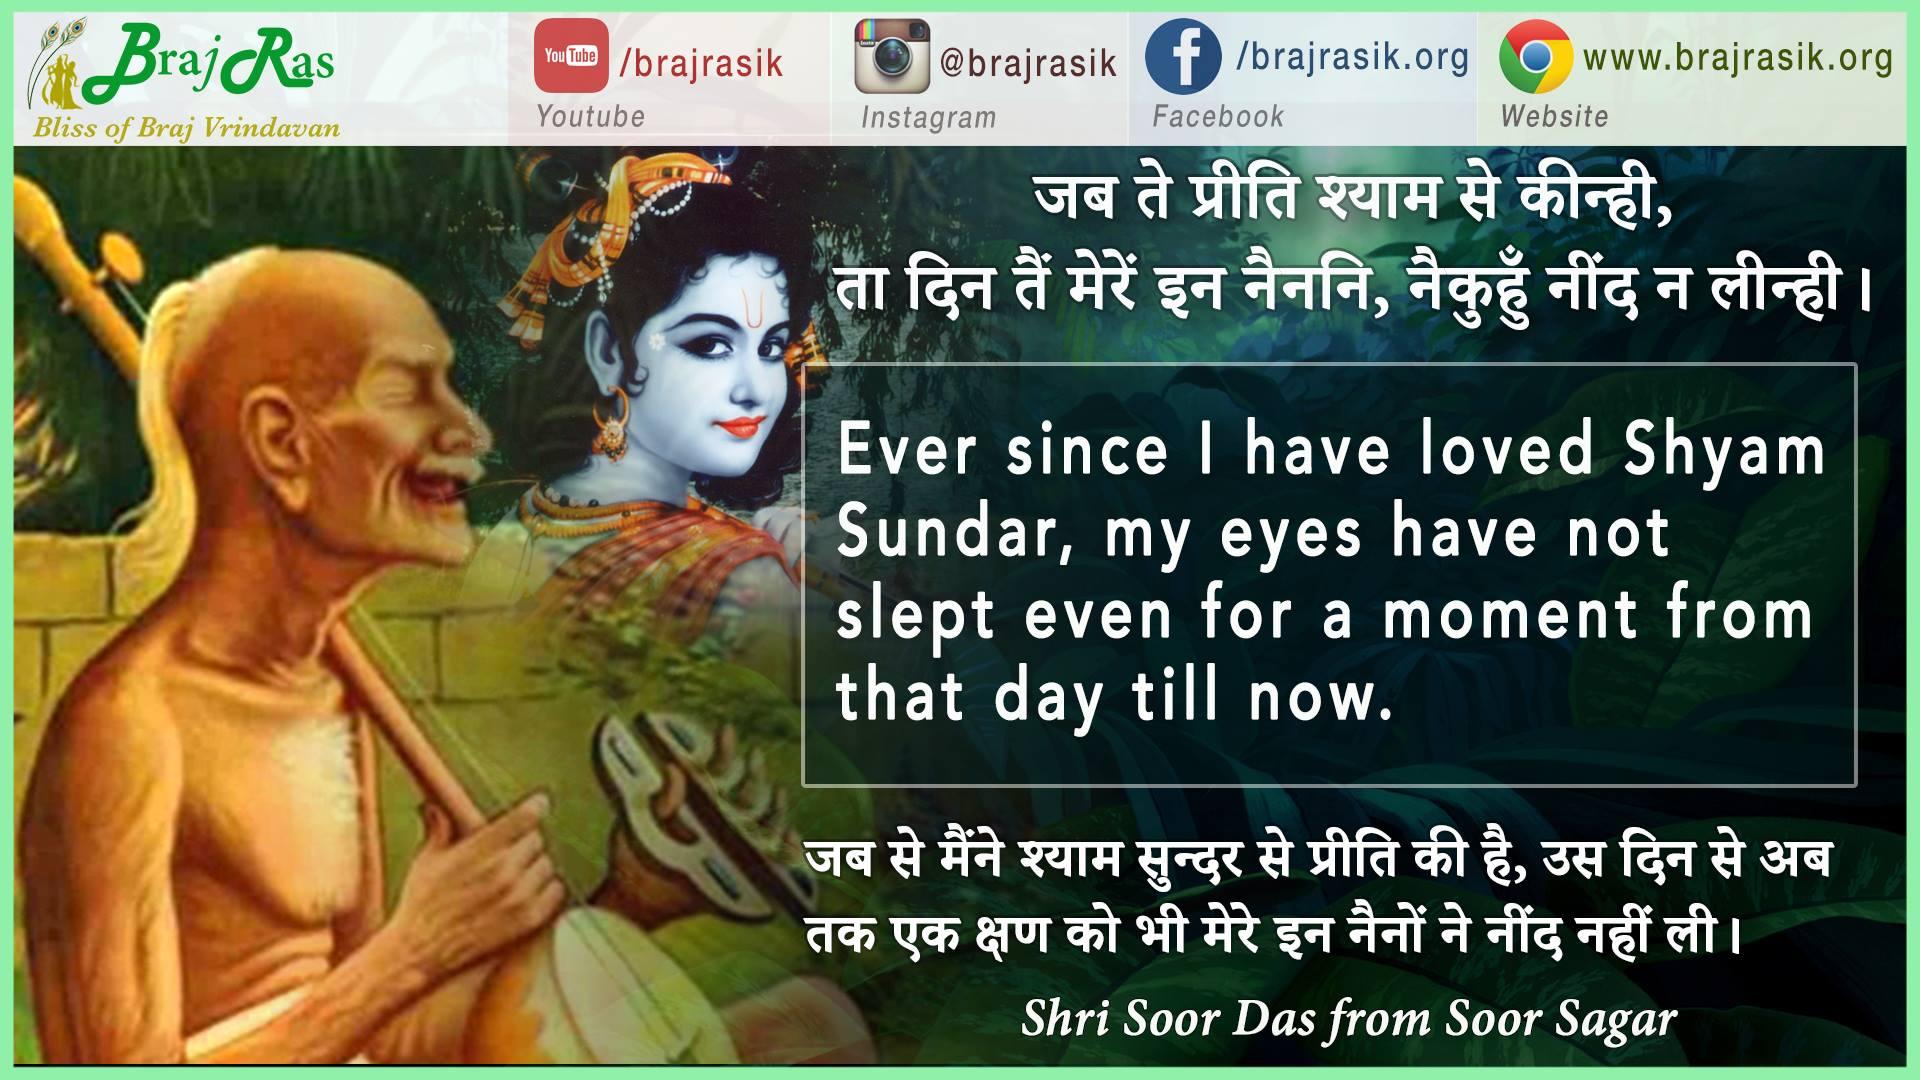 Jab Te Preeti Shyam Se Keenhi - Shri Soordas, Soorsagar